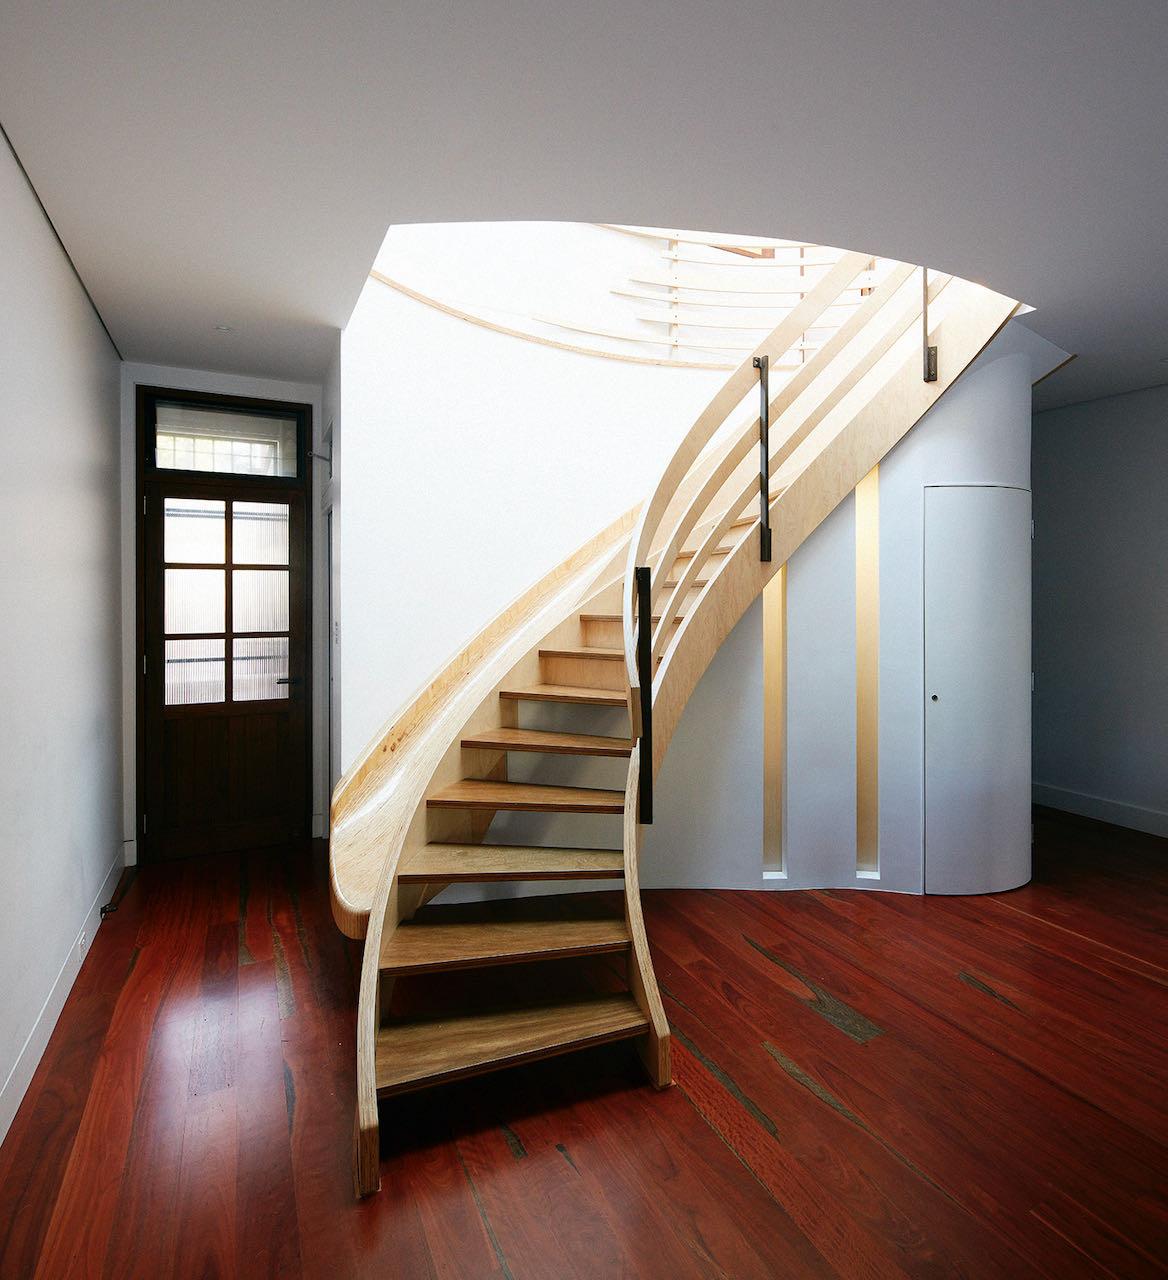 Stairs Pano B.jpeg